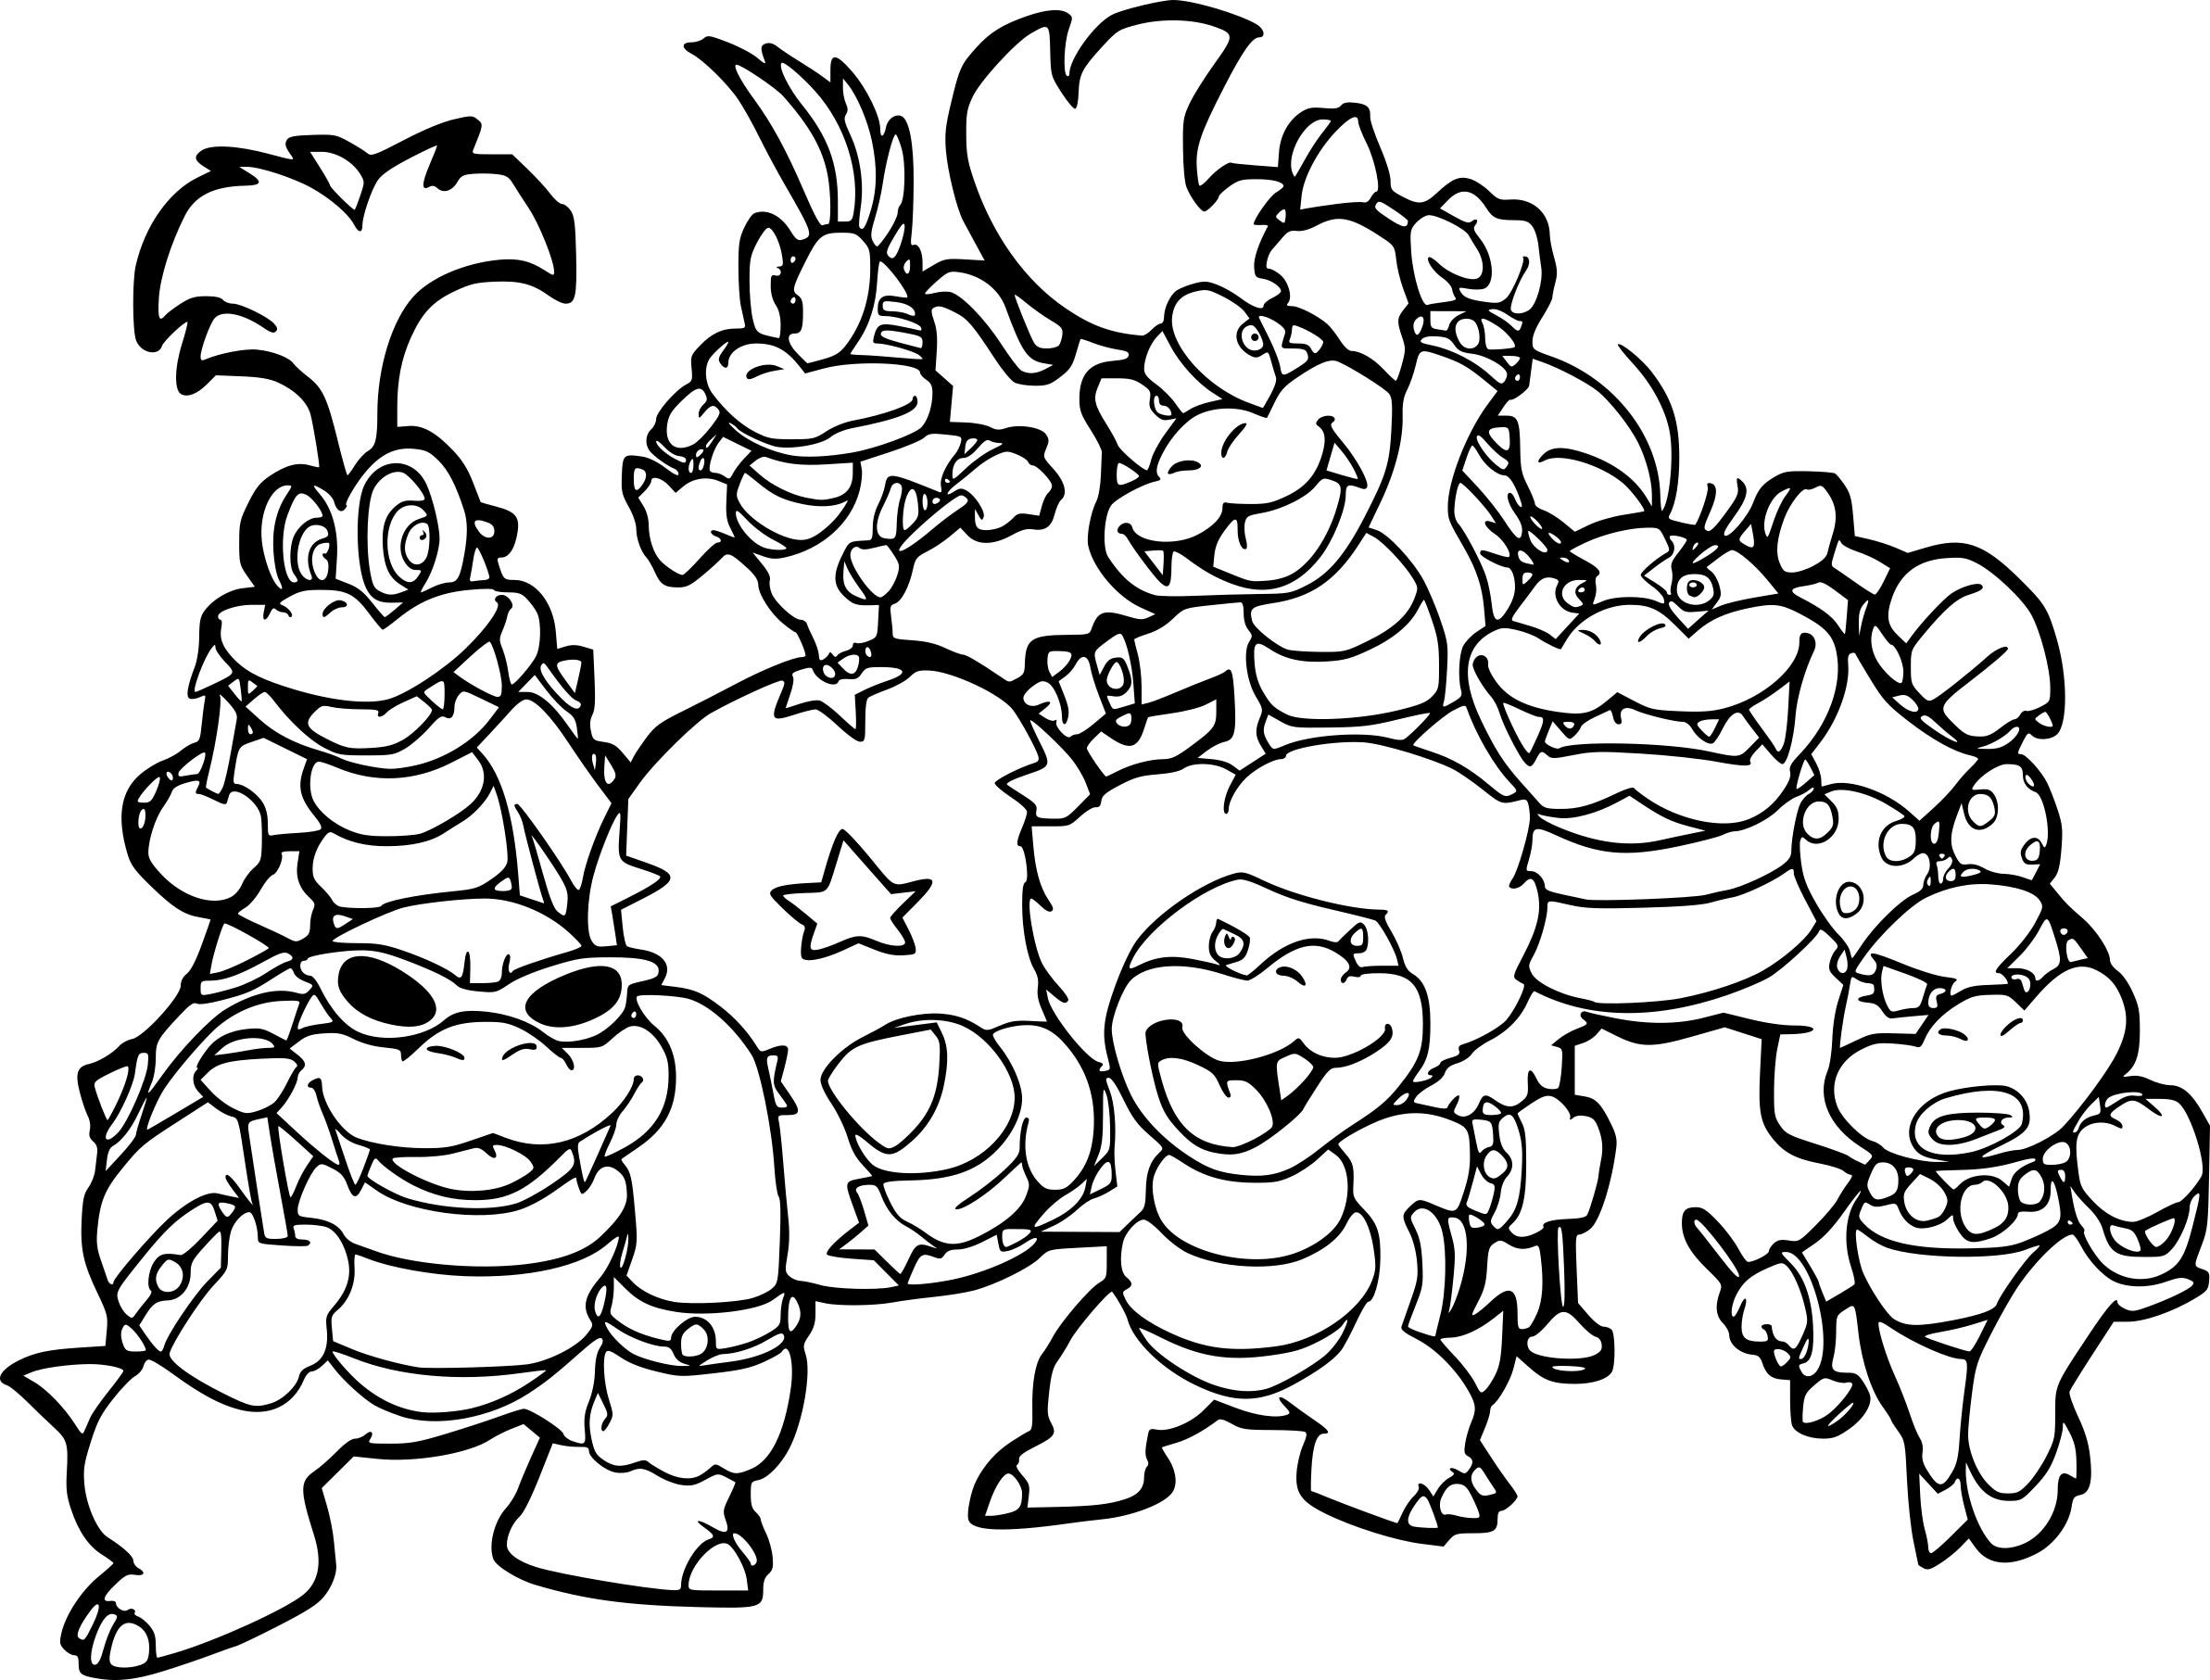 Coloriage Mario Bros A Imprimer Sur Coloriages Info